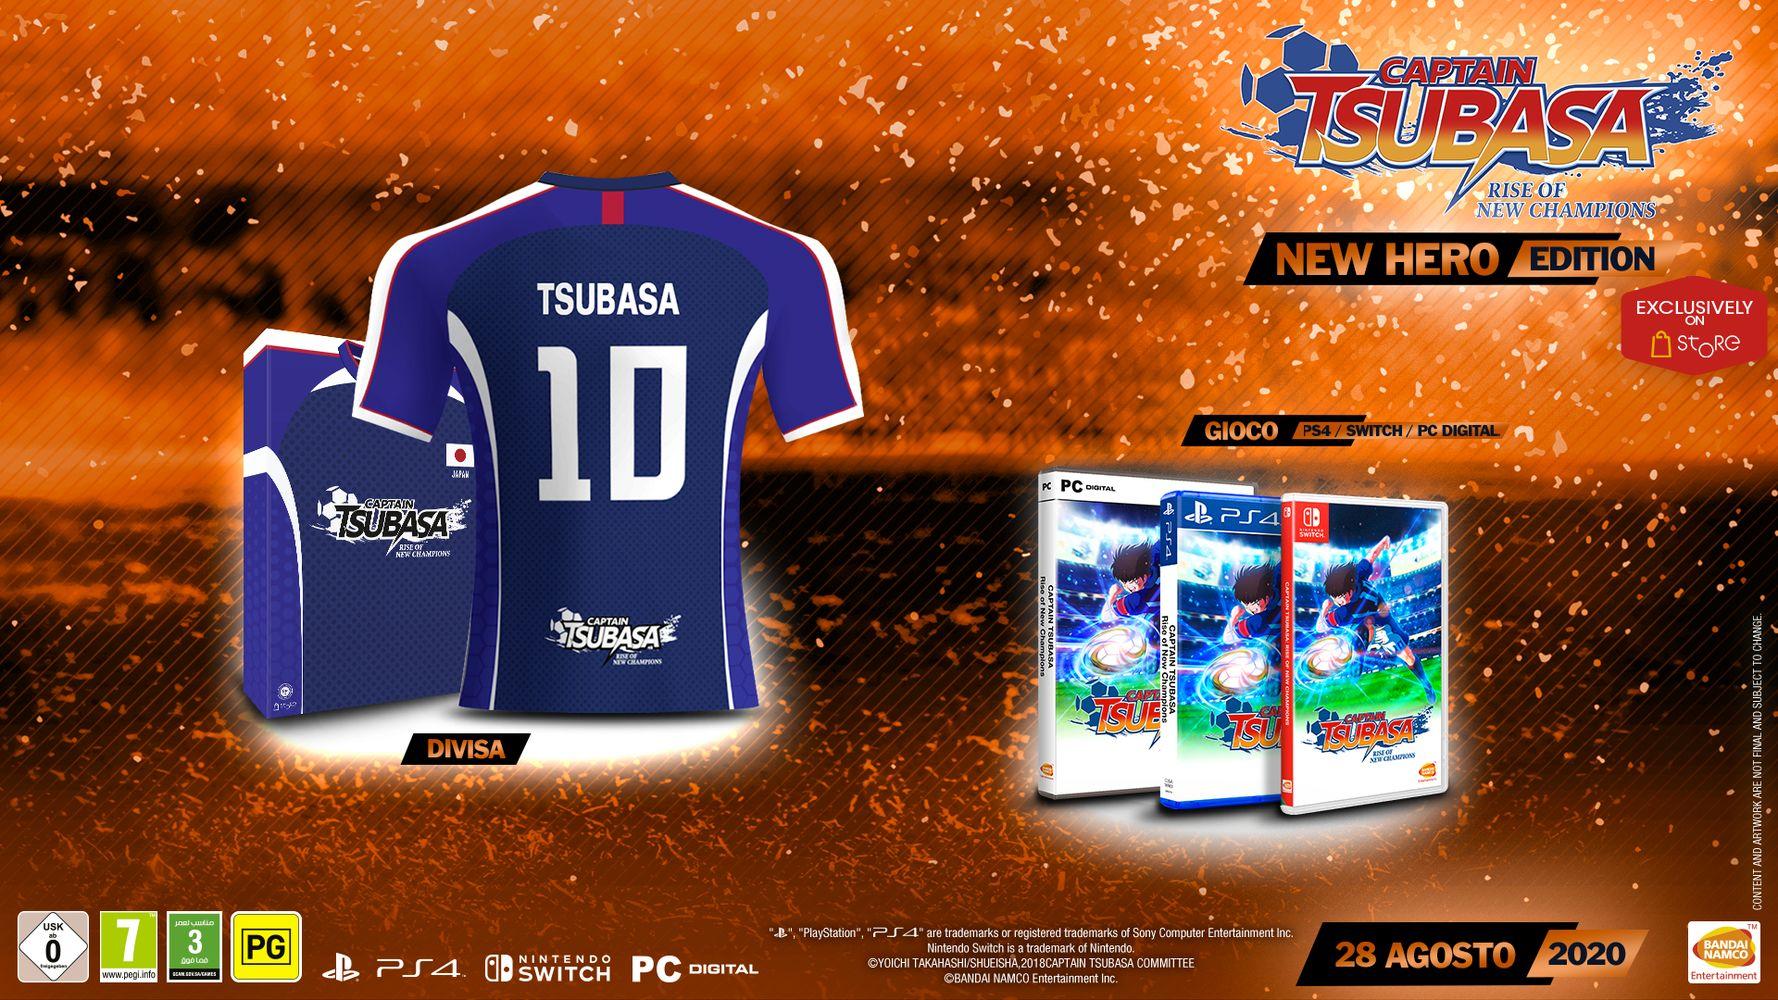 New Hero Edition - Captain Tsubasa: Rise of New Champions